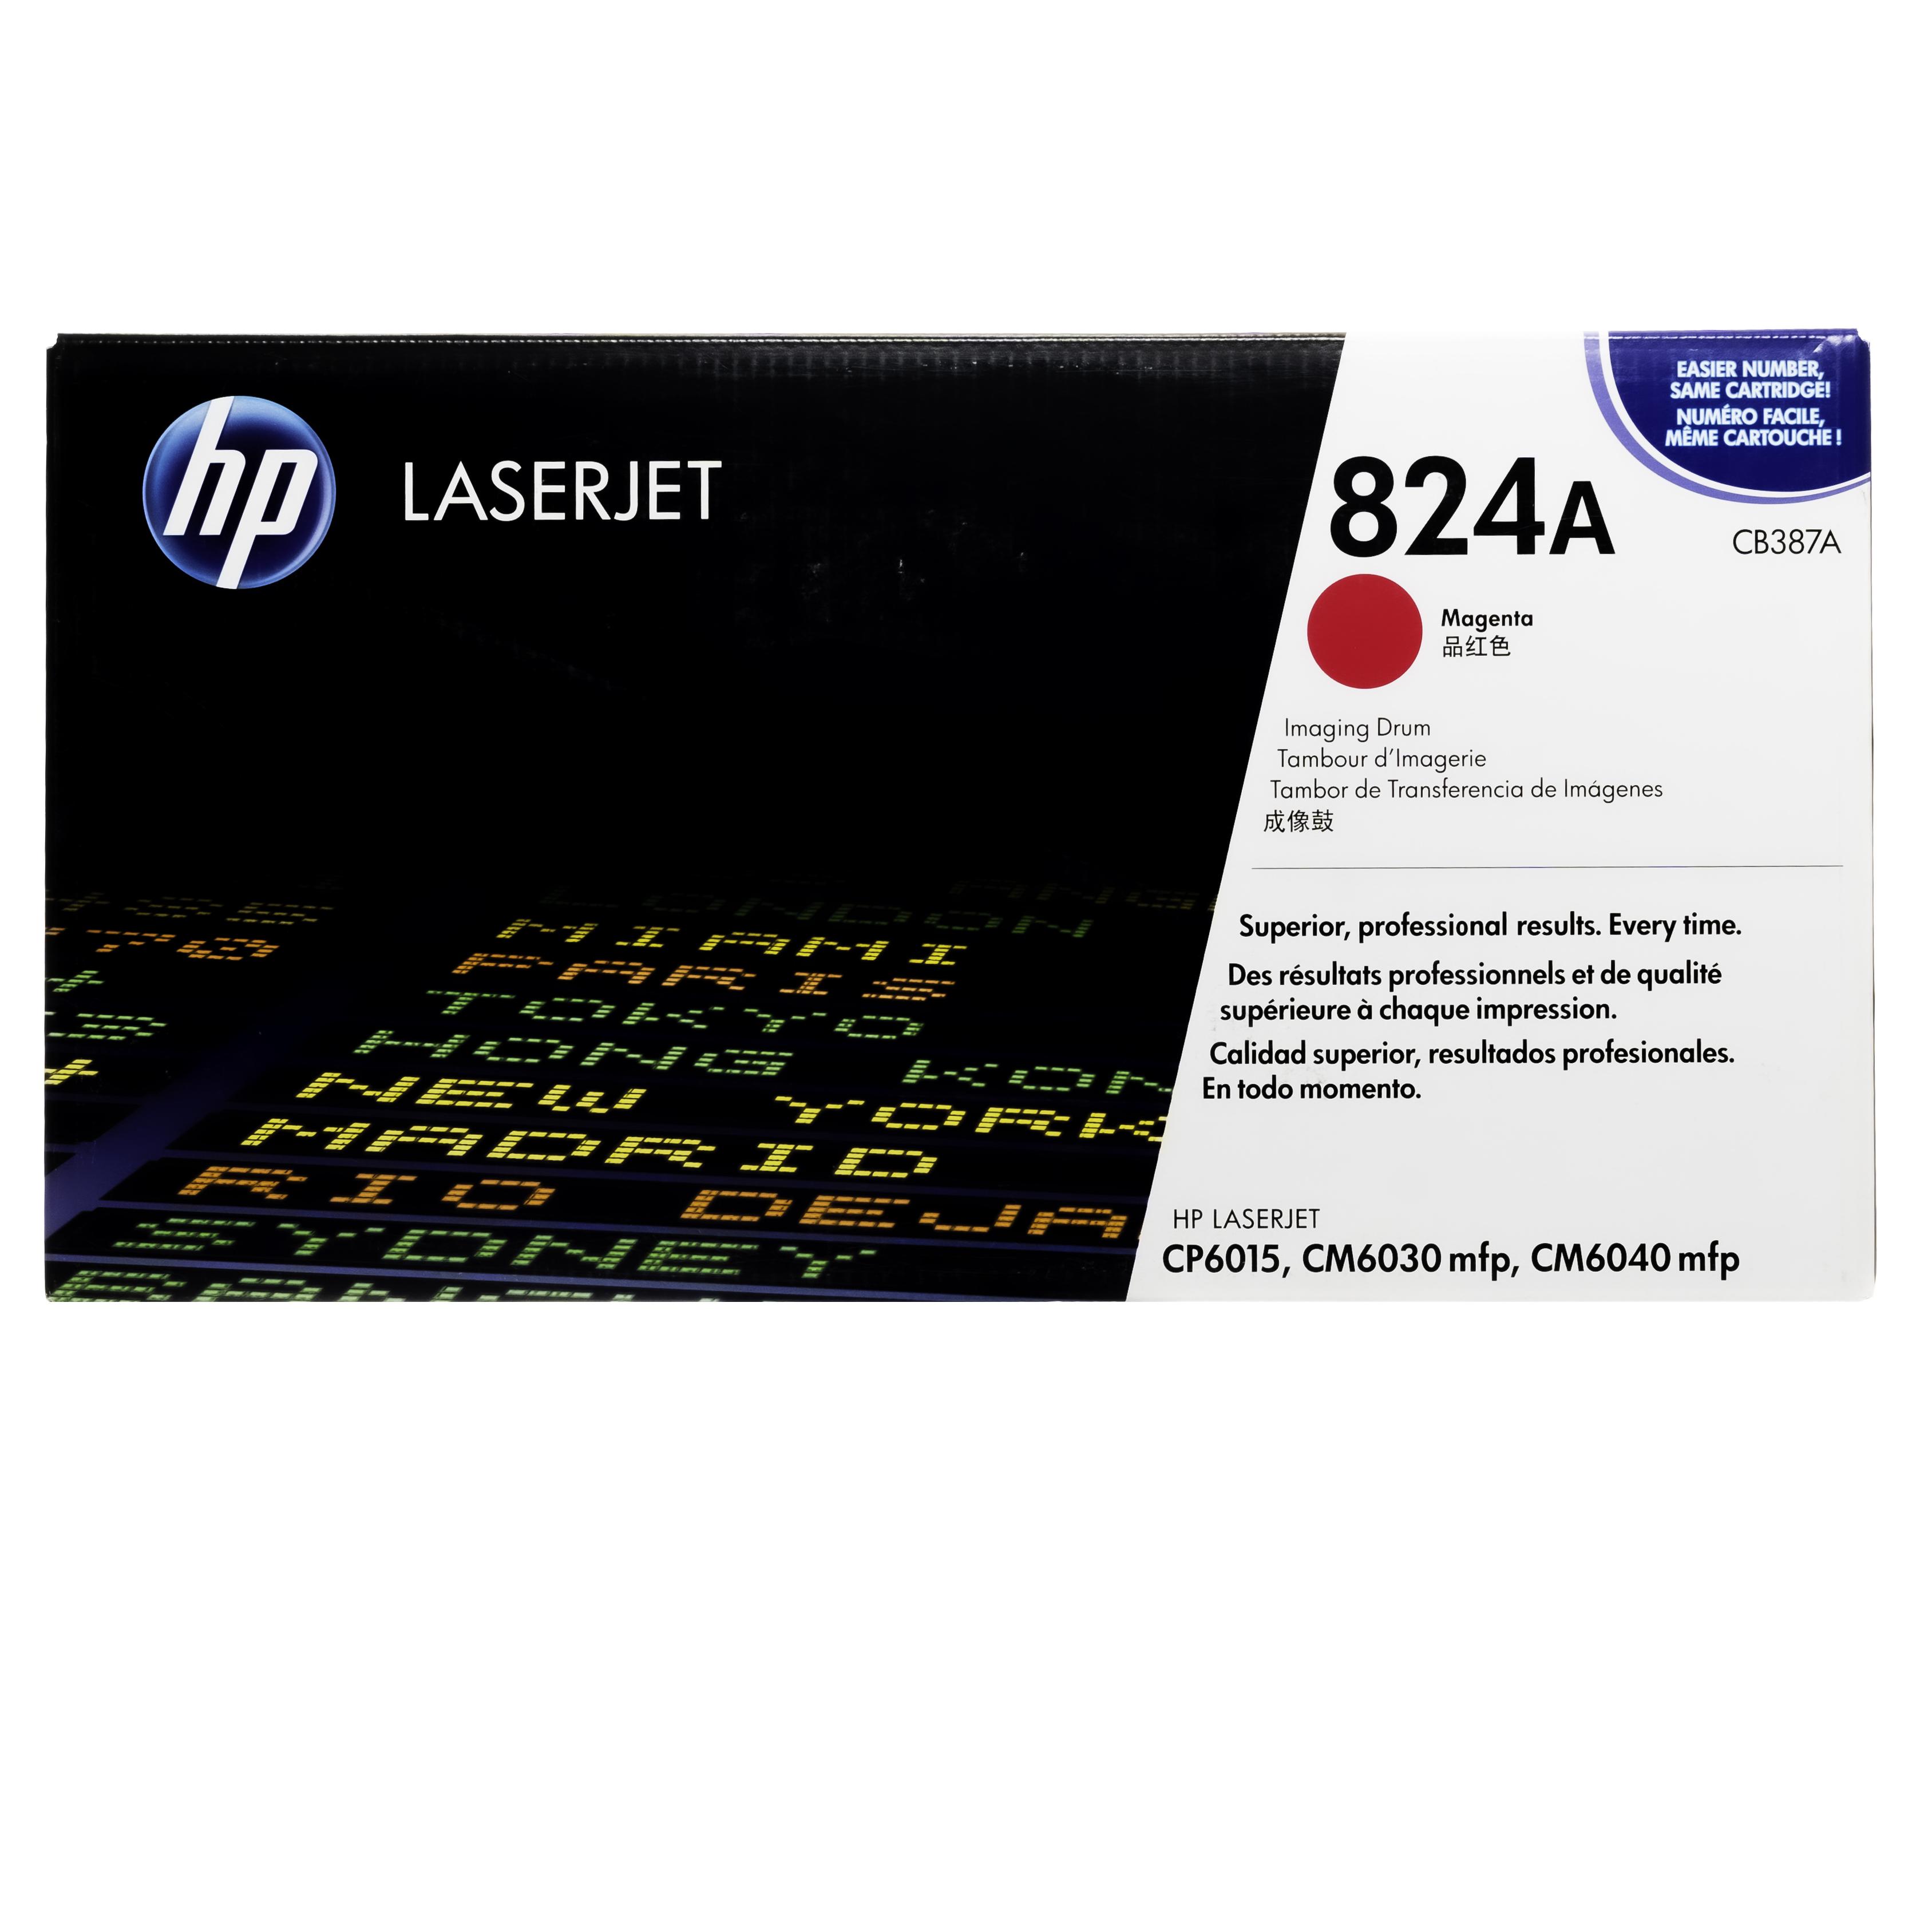 CB387A | HP 824A | Original HP Drum Unit – Magenta